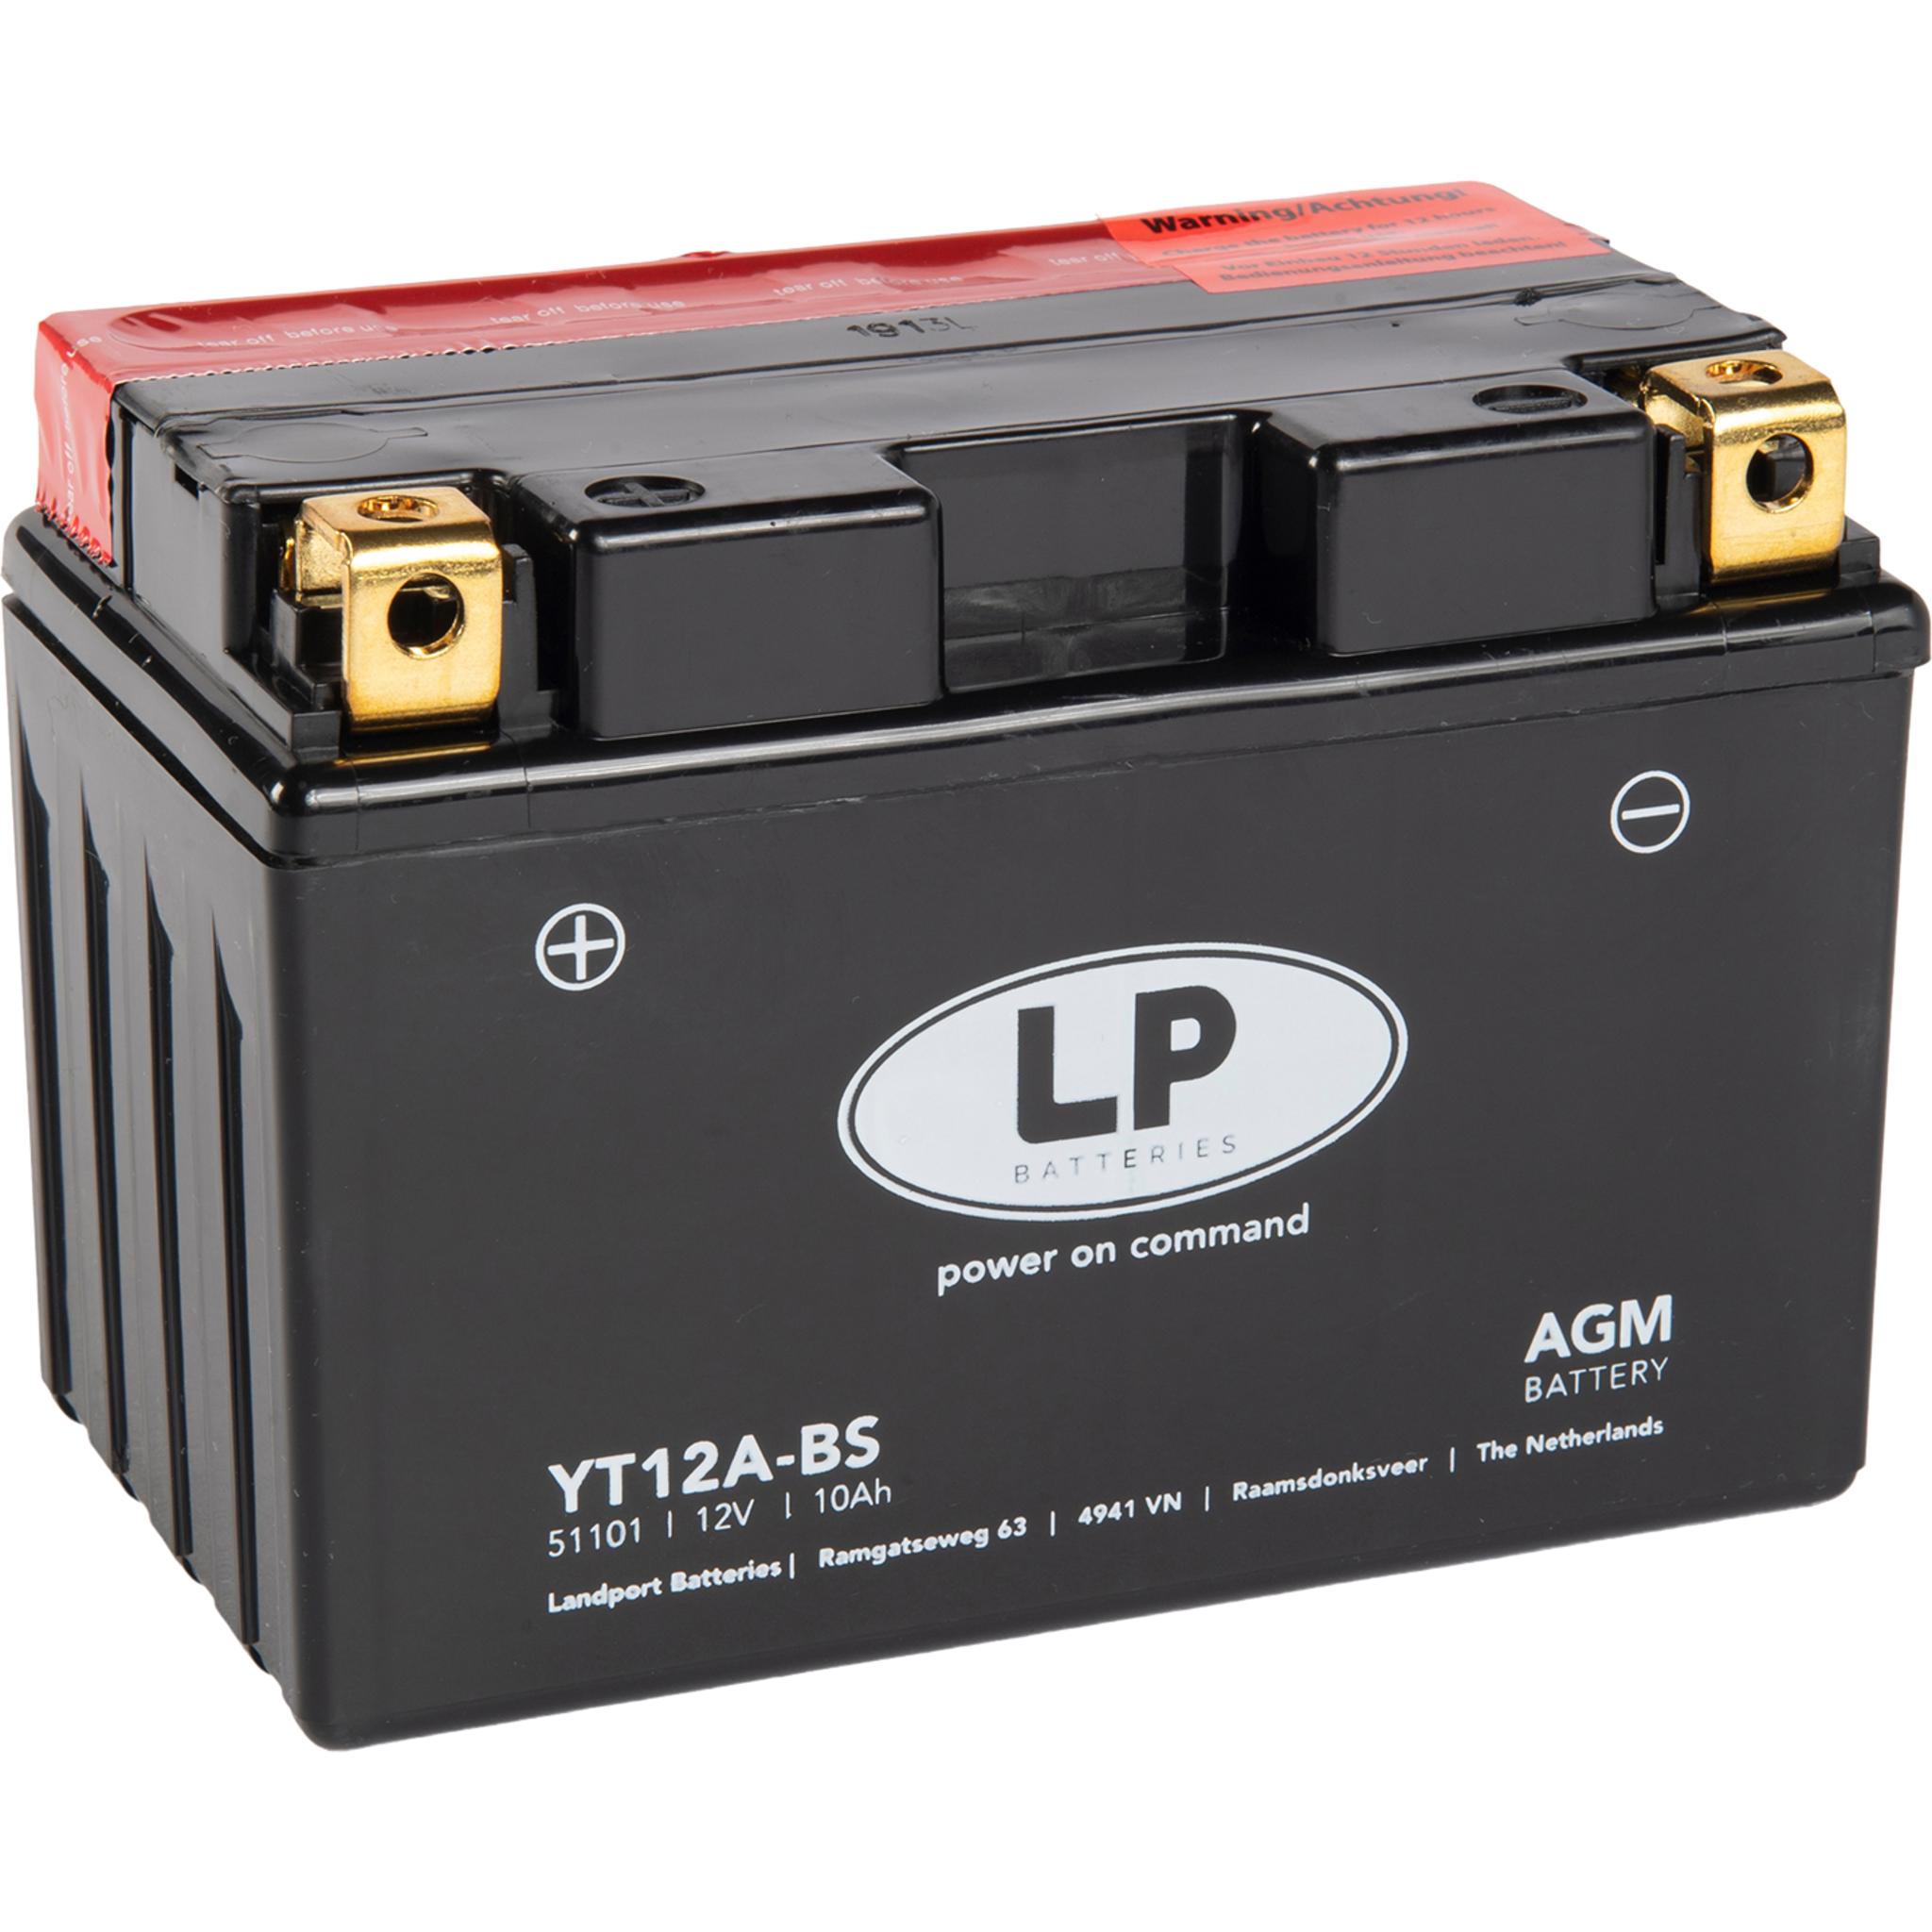 Аккумулятор Landport YT12A-BS, 12V, AGM